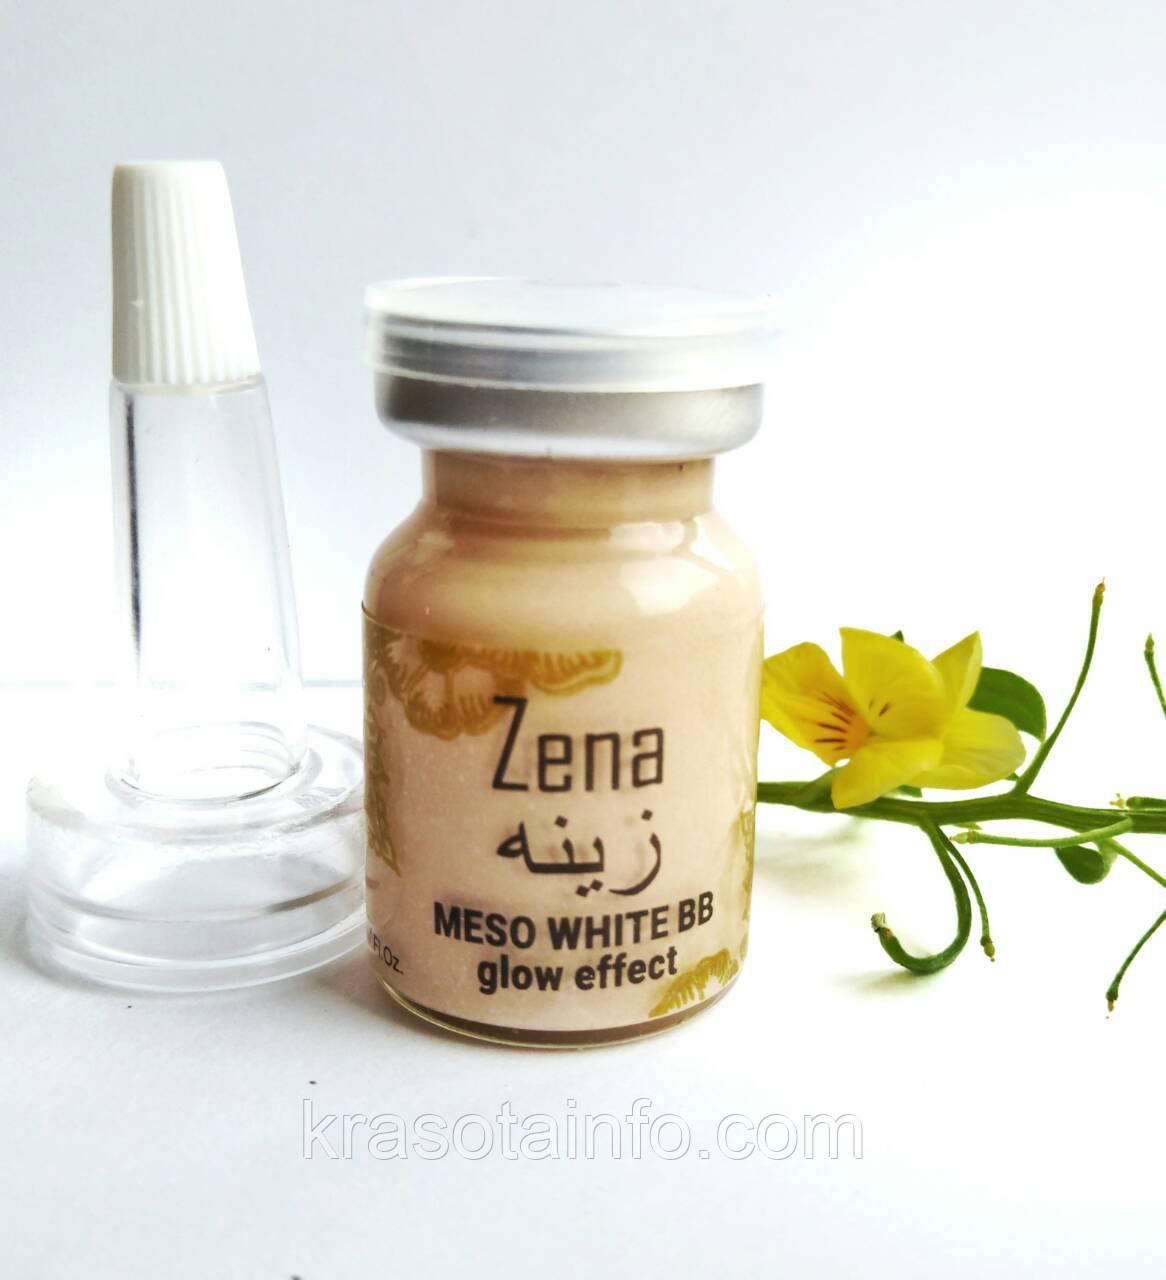 BB glow treatment ББ мезо для процедуры бб глоу тритмент BB meso white skin, Zena, 5 мл